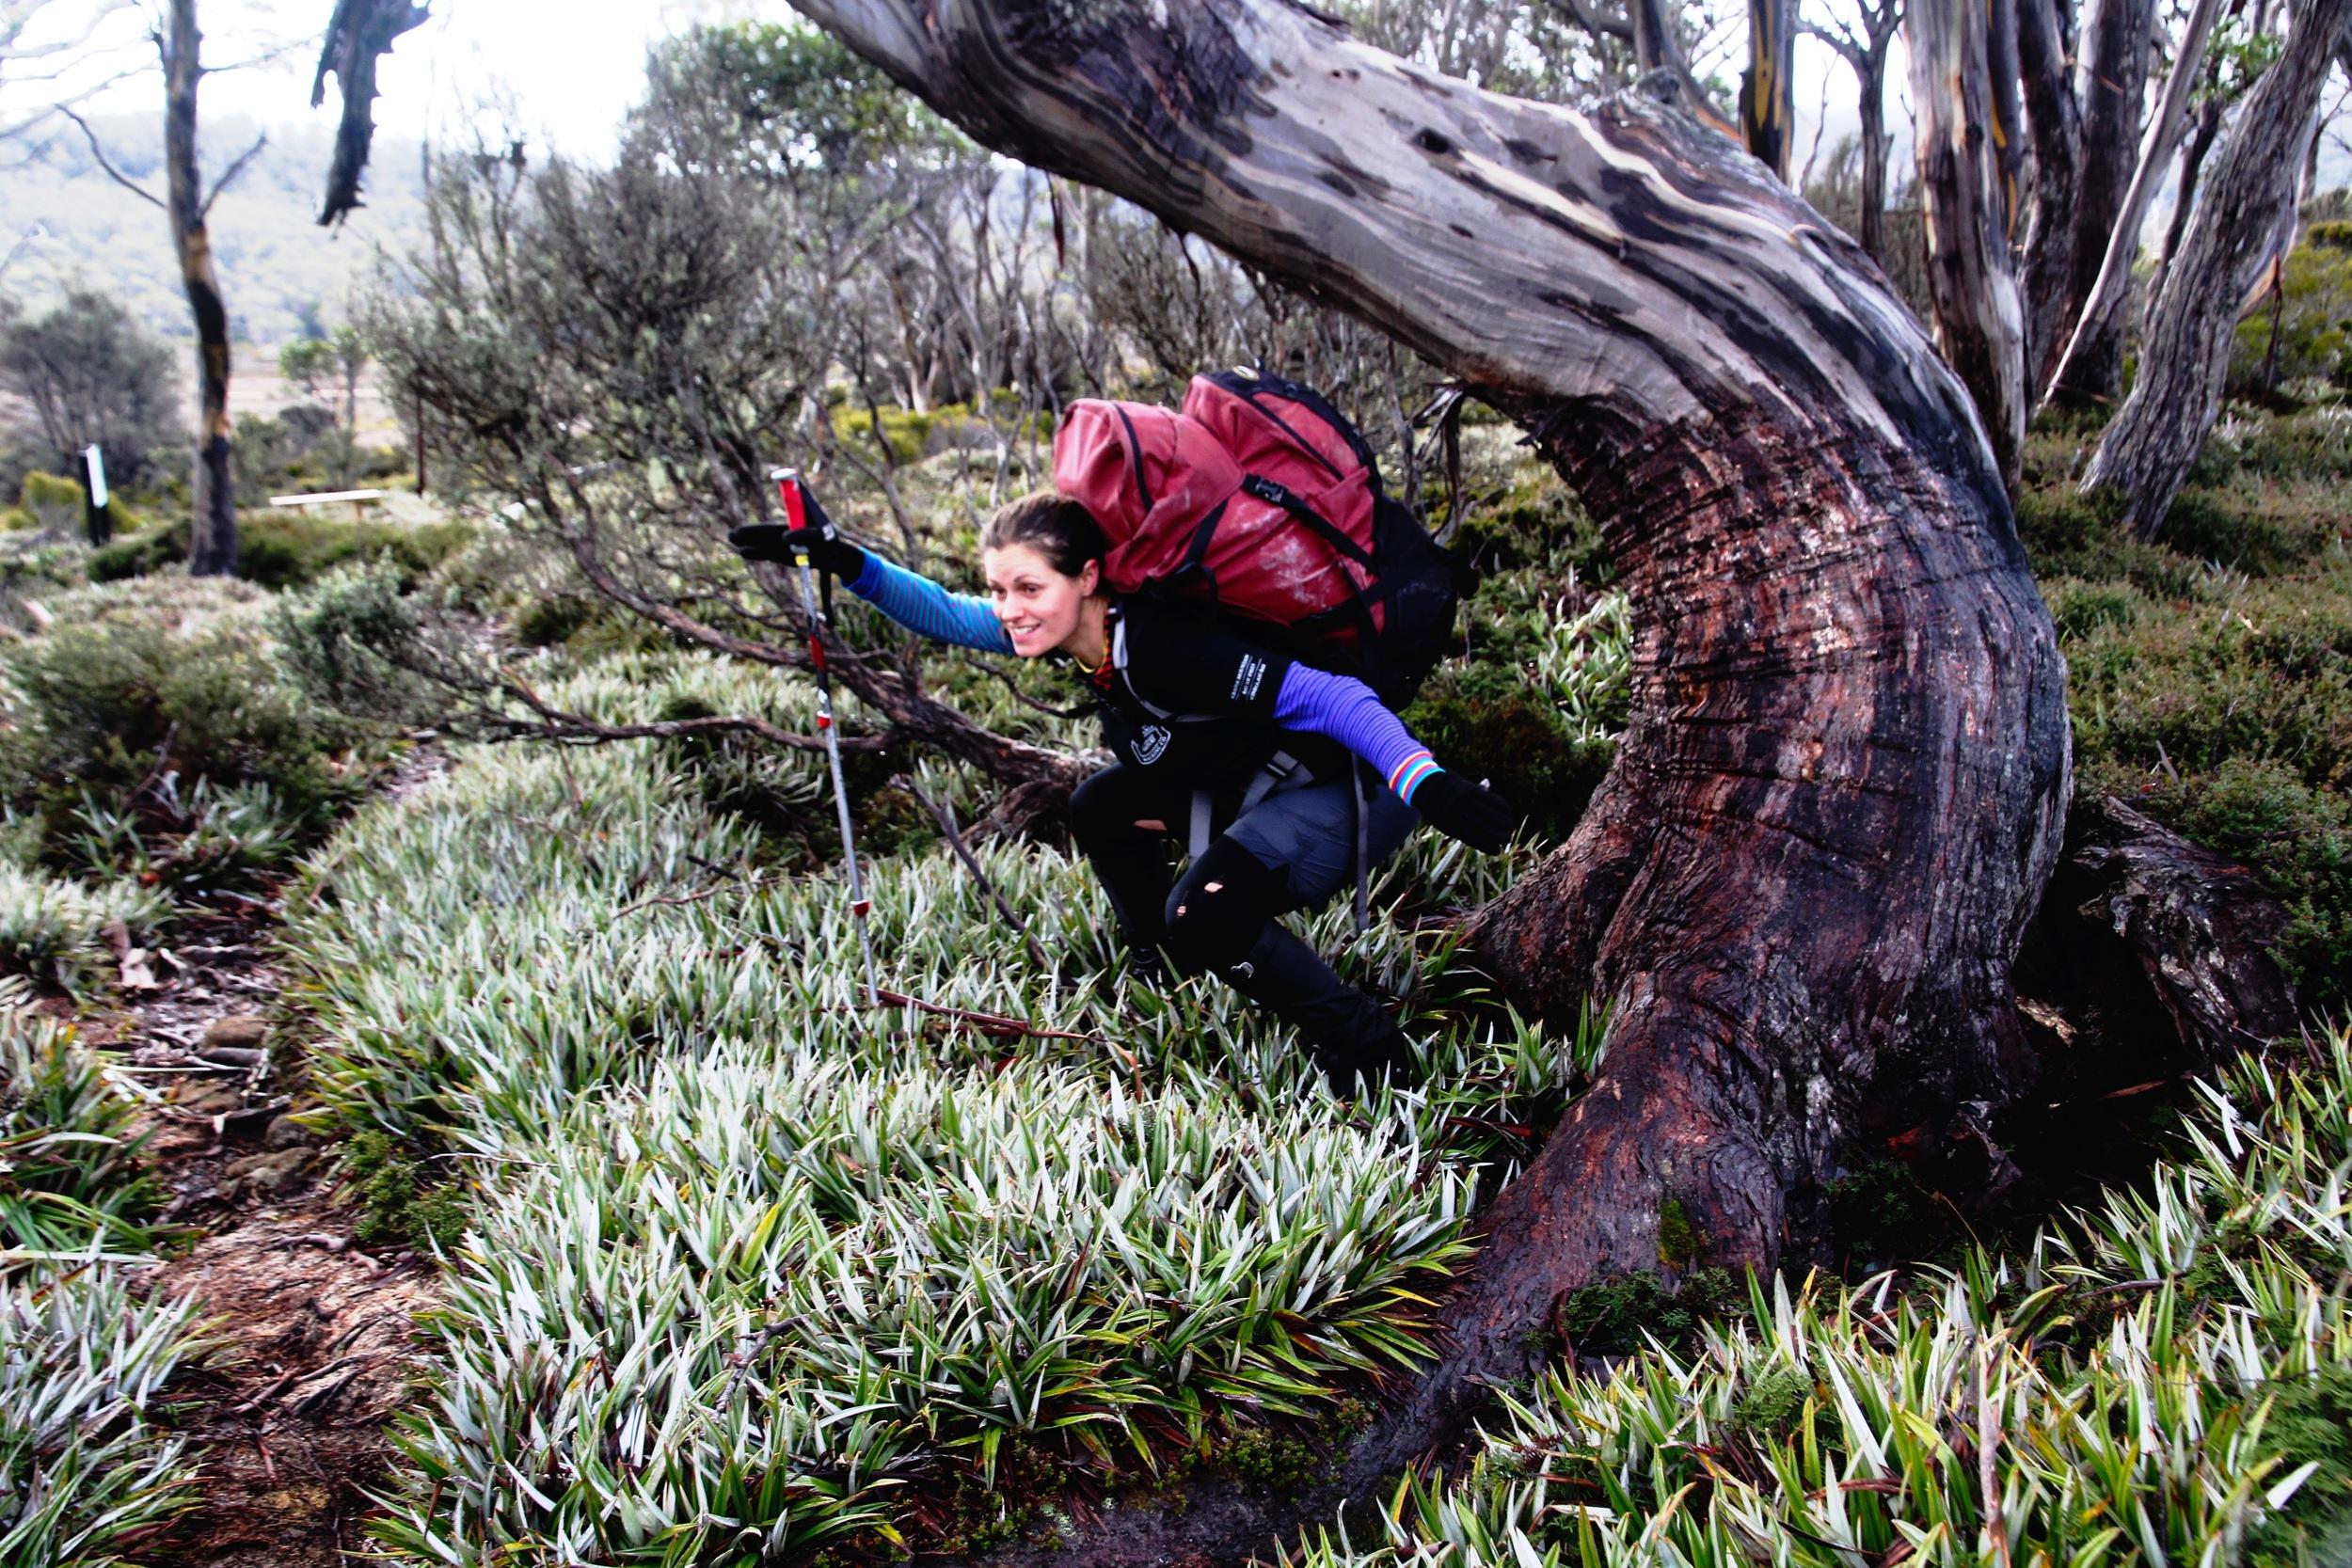 Anita riding the Eucalyptus wave!